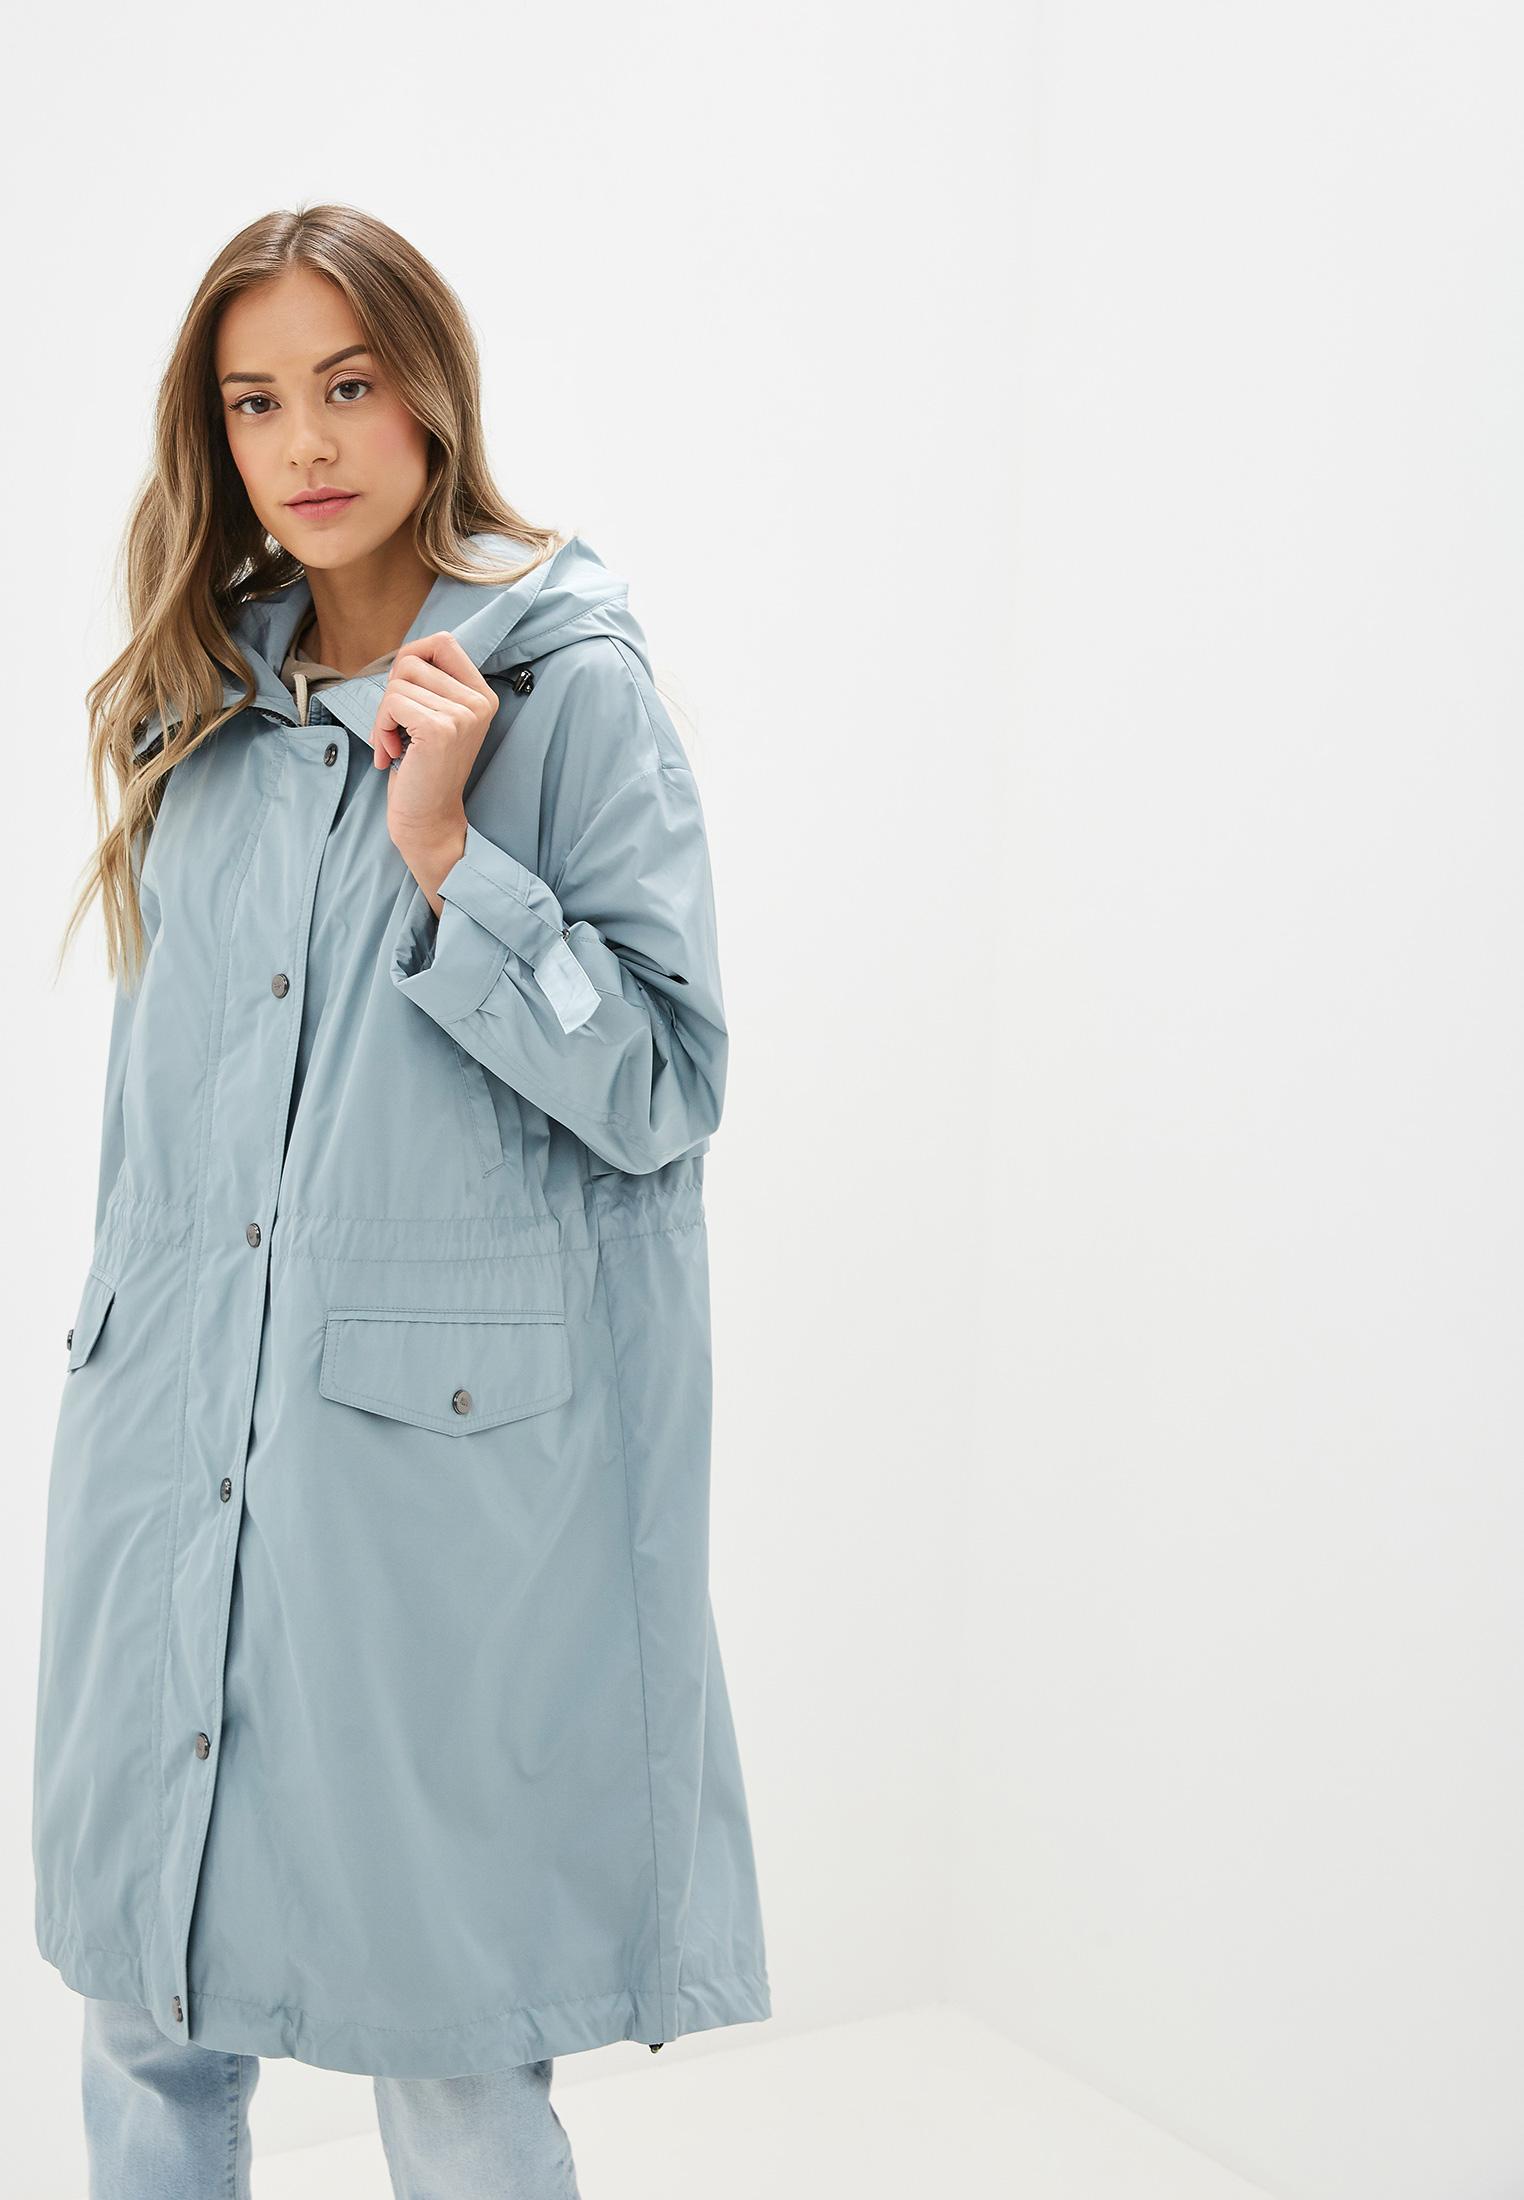 Плащ, Dixi-Coat, цвет: голубой. Артикул: MP002XW01QCQ. Одежда